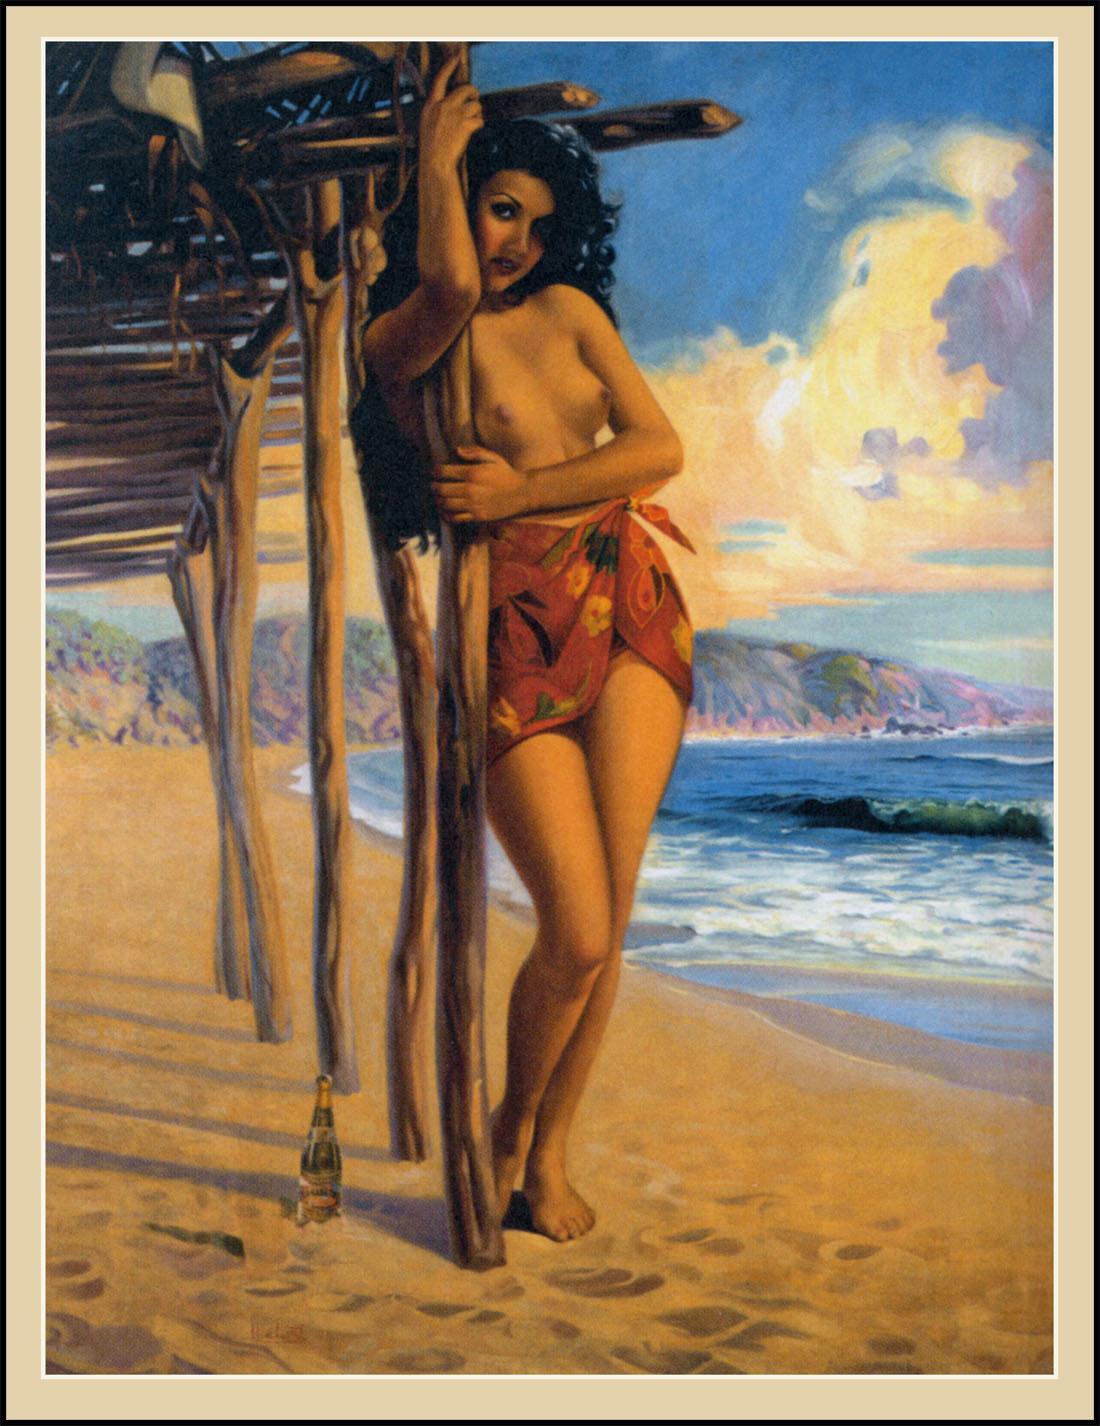 IgnacioMatusF_WomanAtTheBeach_1955_100.jpg (1100×1426)